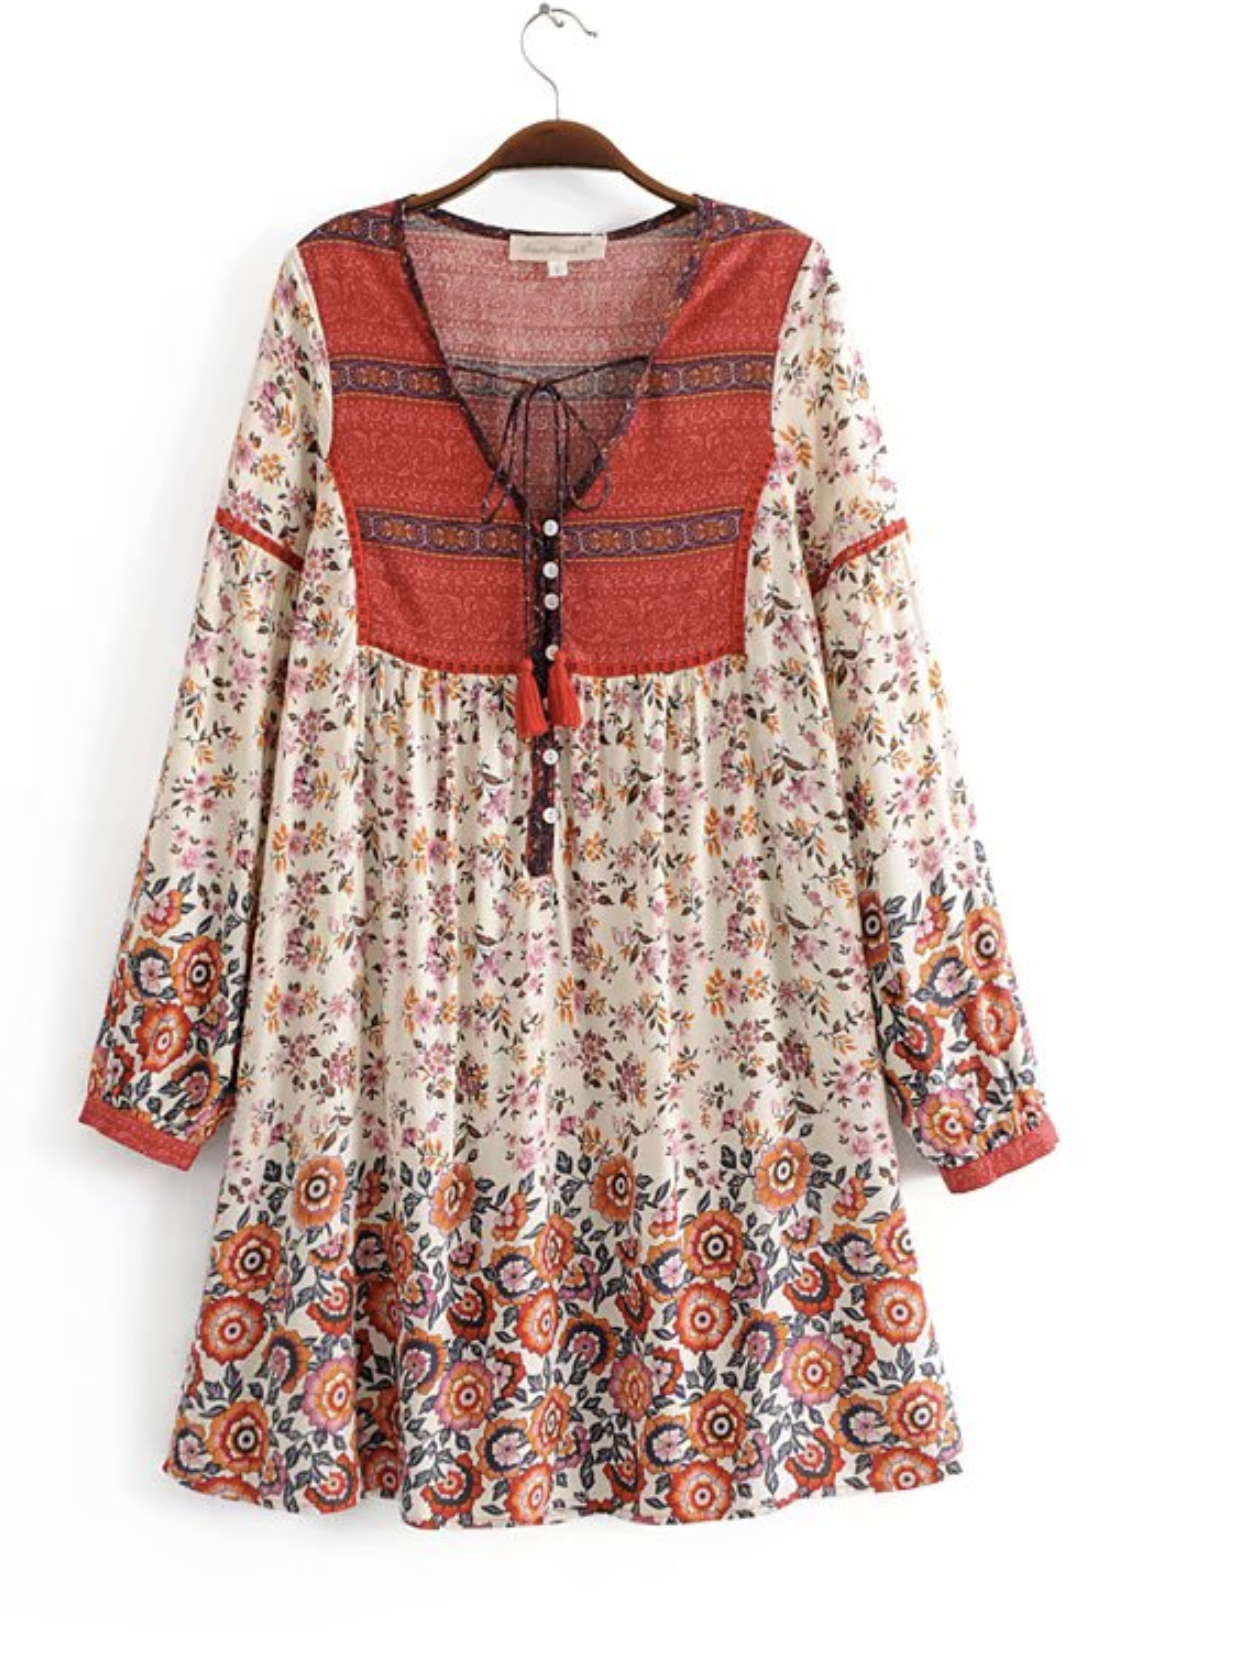 Robe imprimée hippie vintage boho boheme chic dress1777